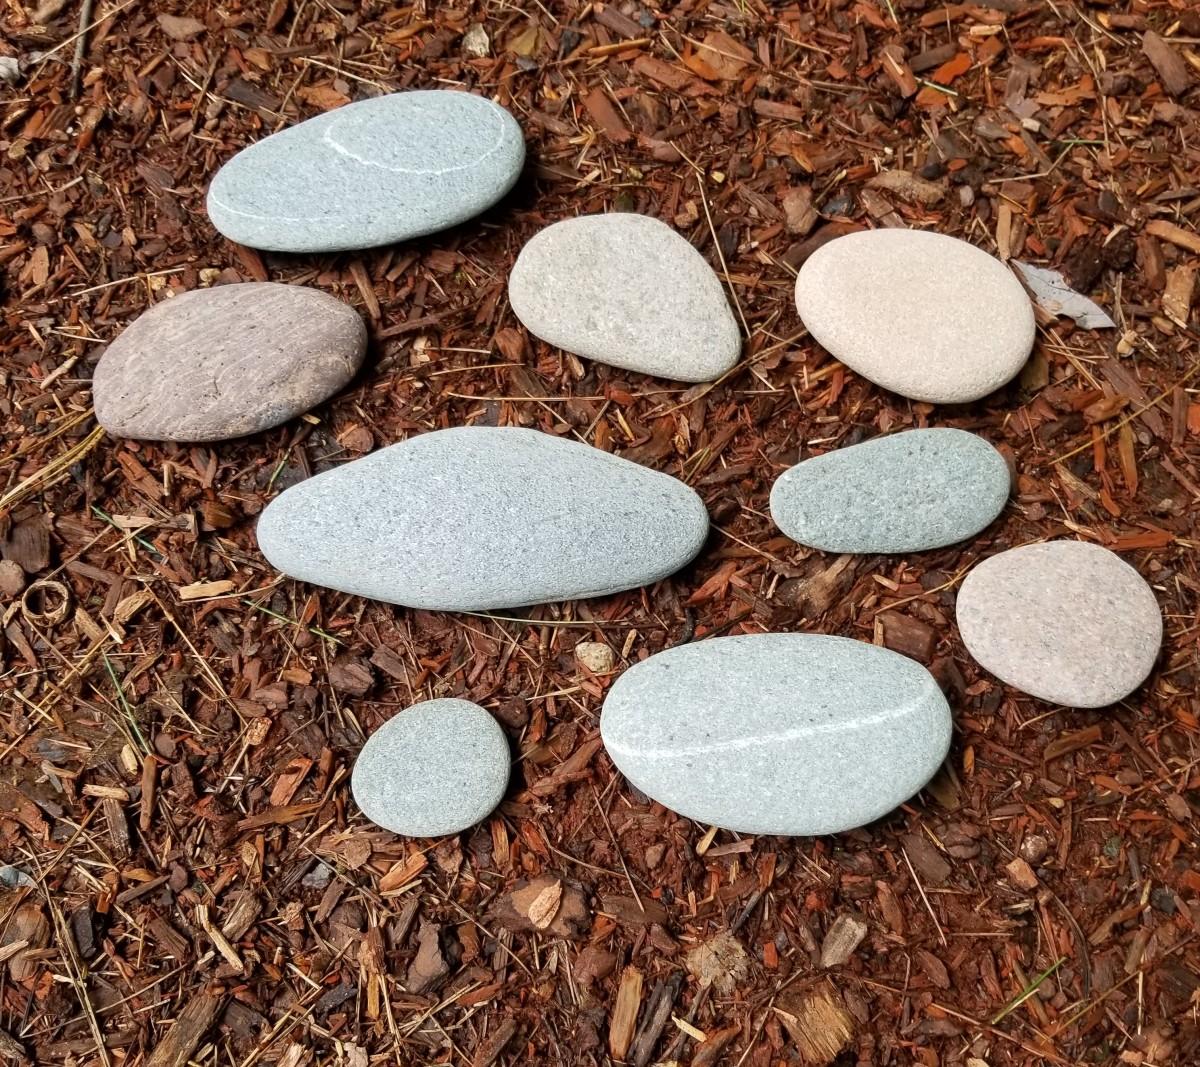 Nova Scotia beach pebbles.